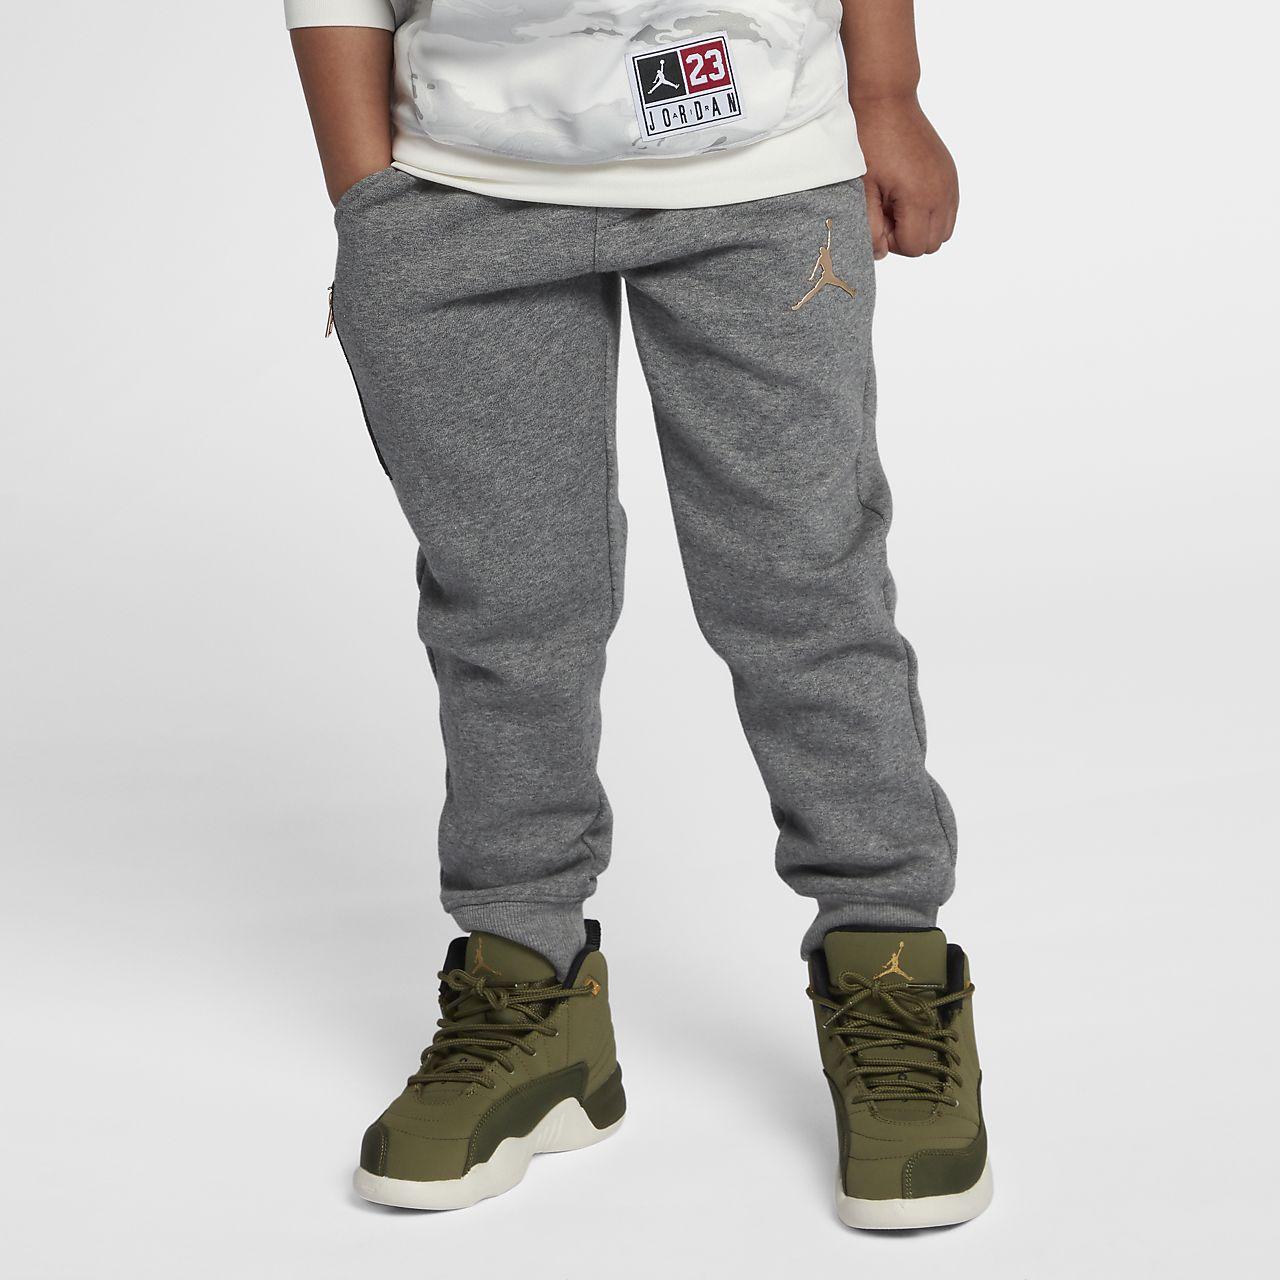 b14a69a7a38799 Jordan Younger Kids  Joggers. Nike.com LU